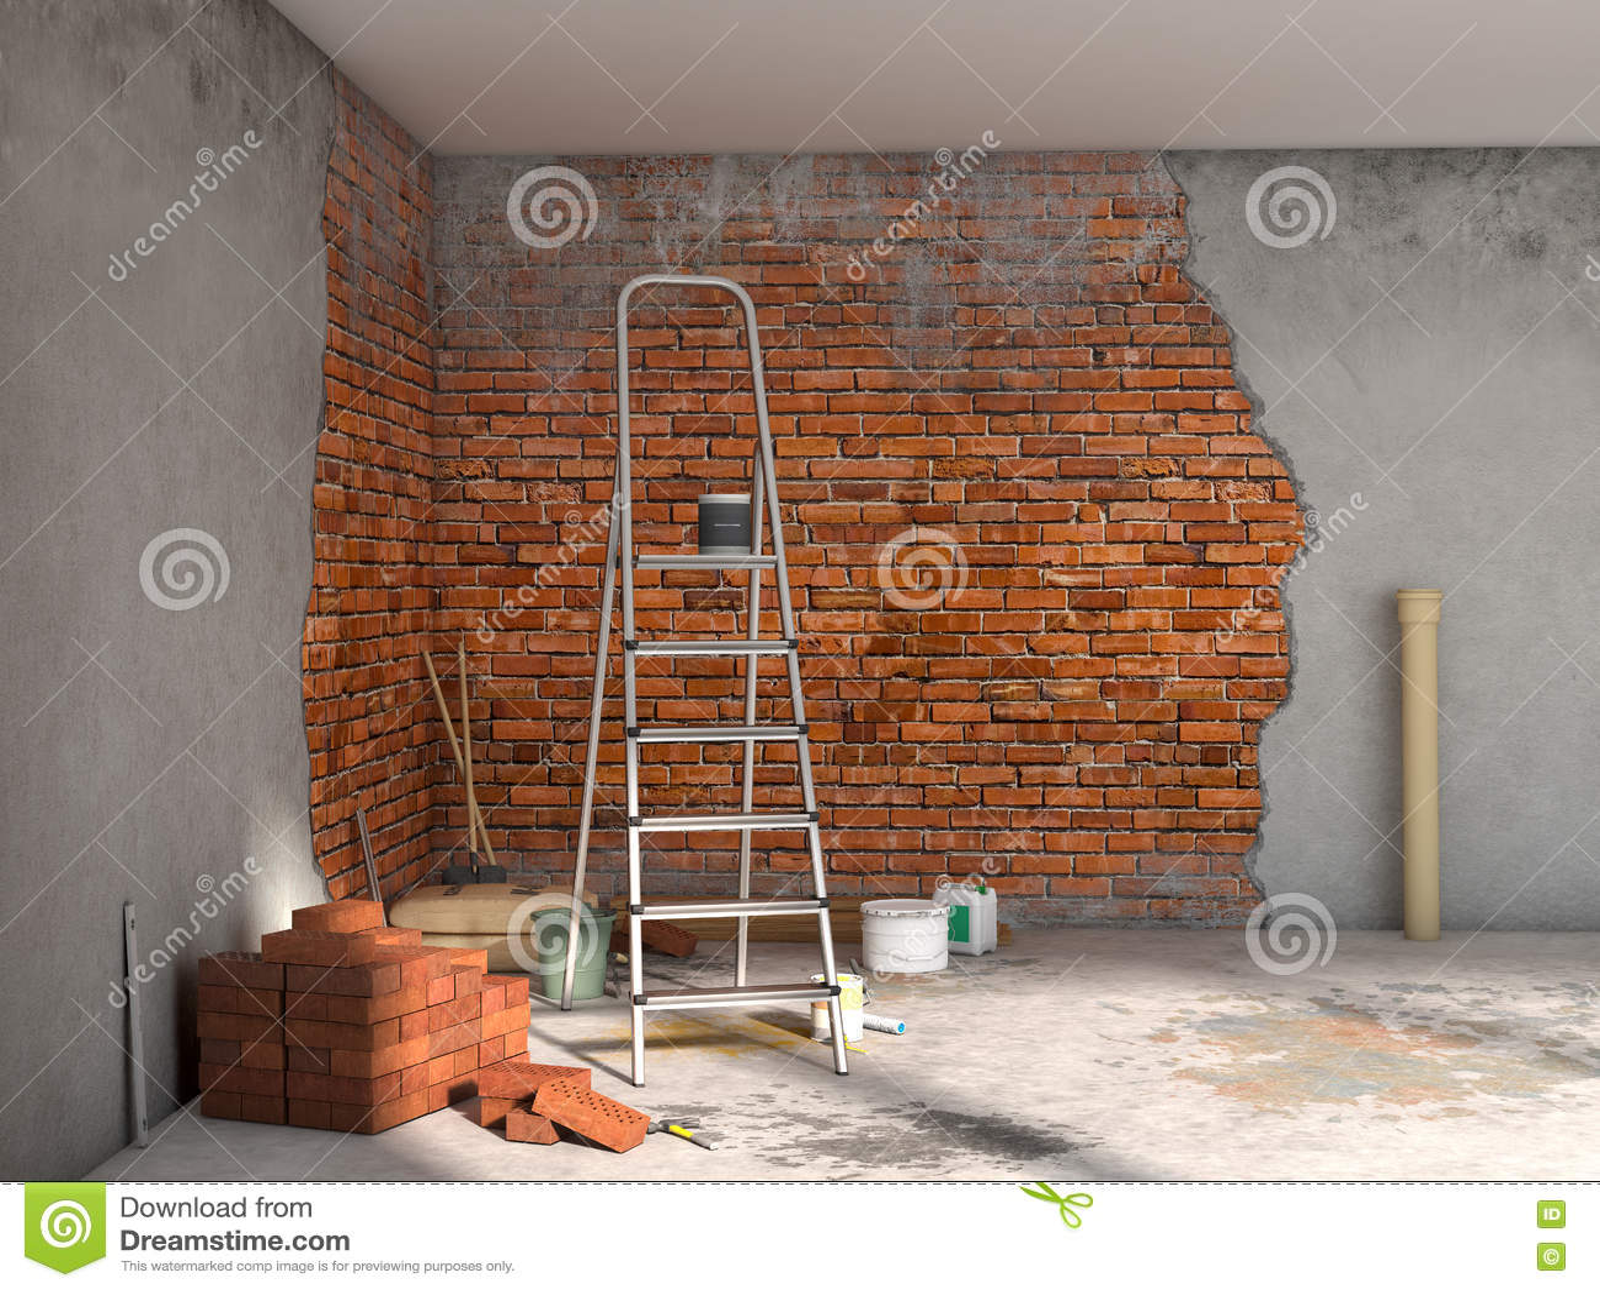 Repairs Room  Stock Illustration  Illustration Of Dirty